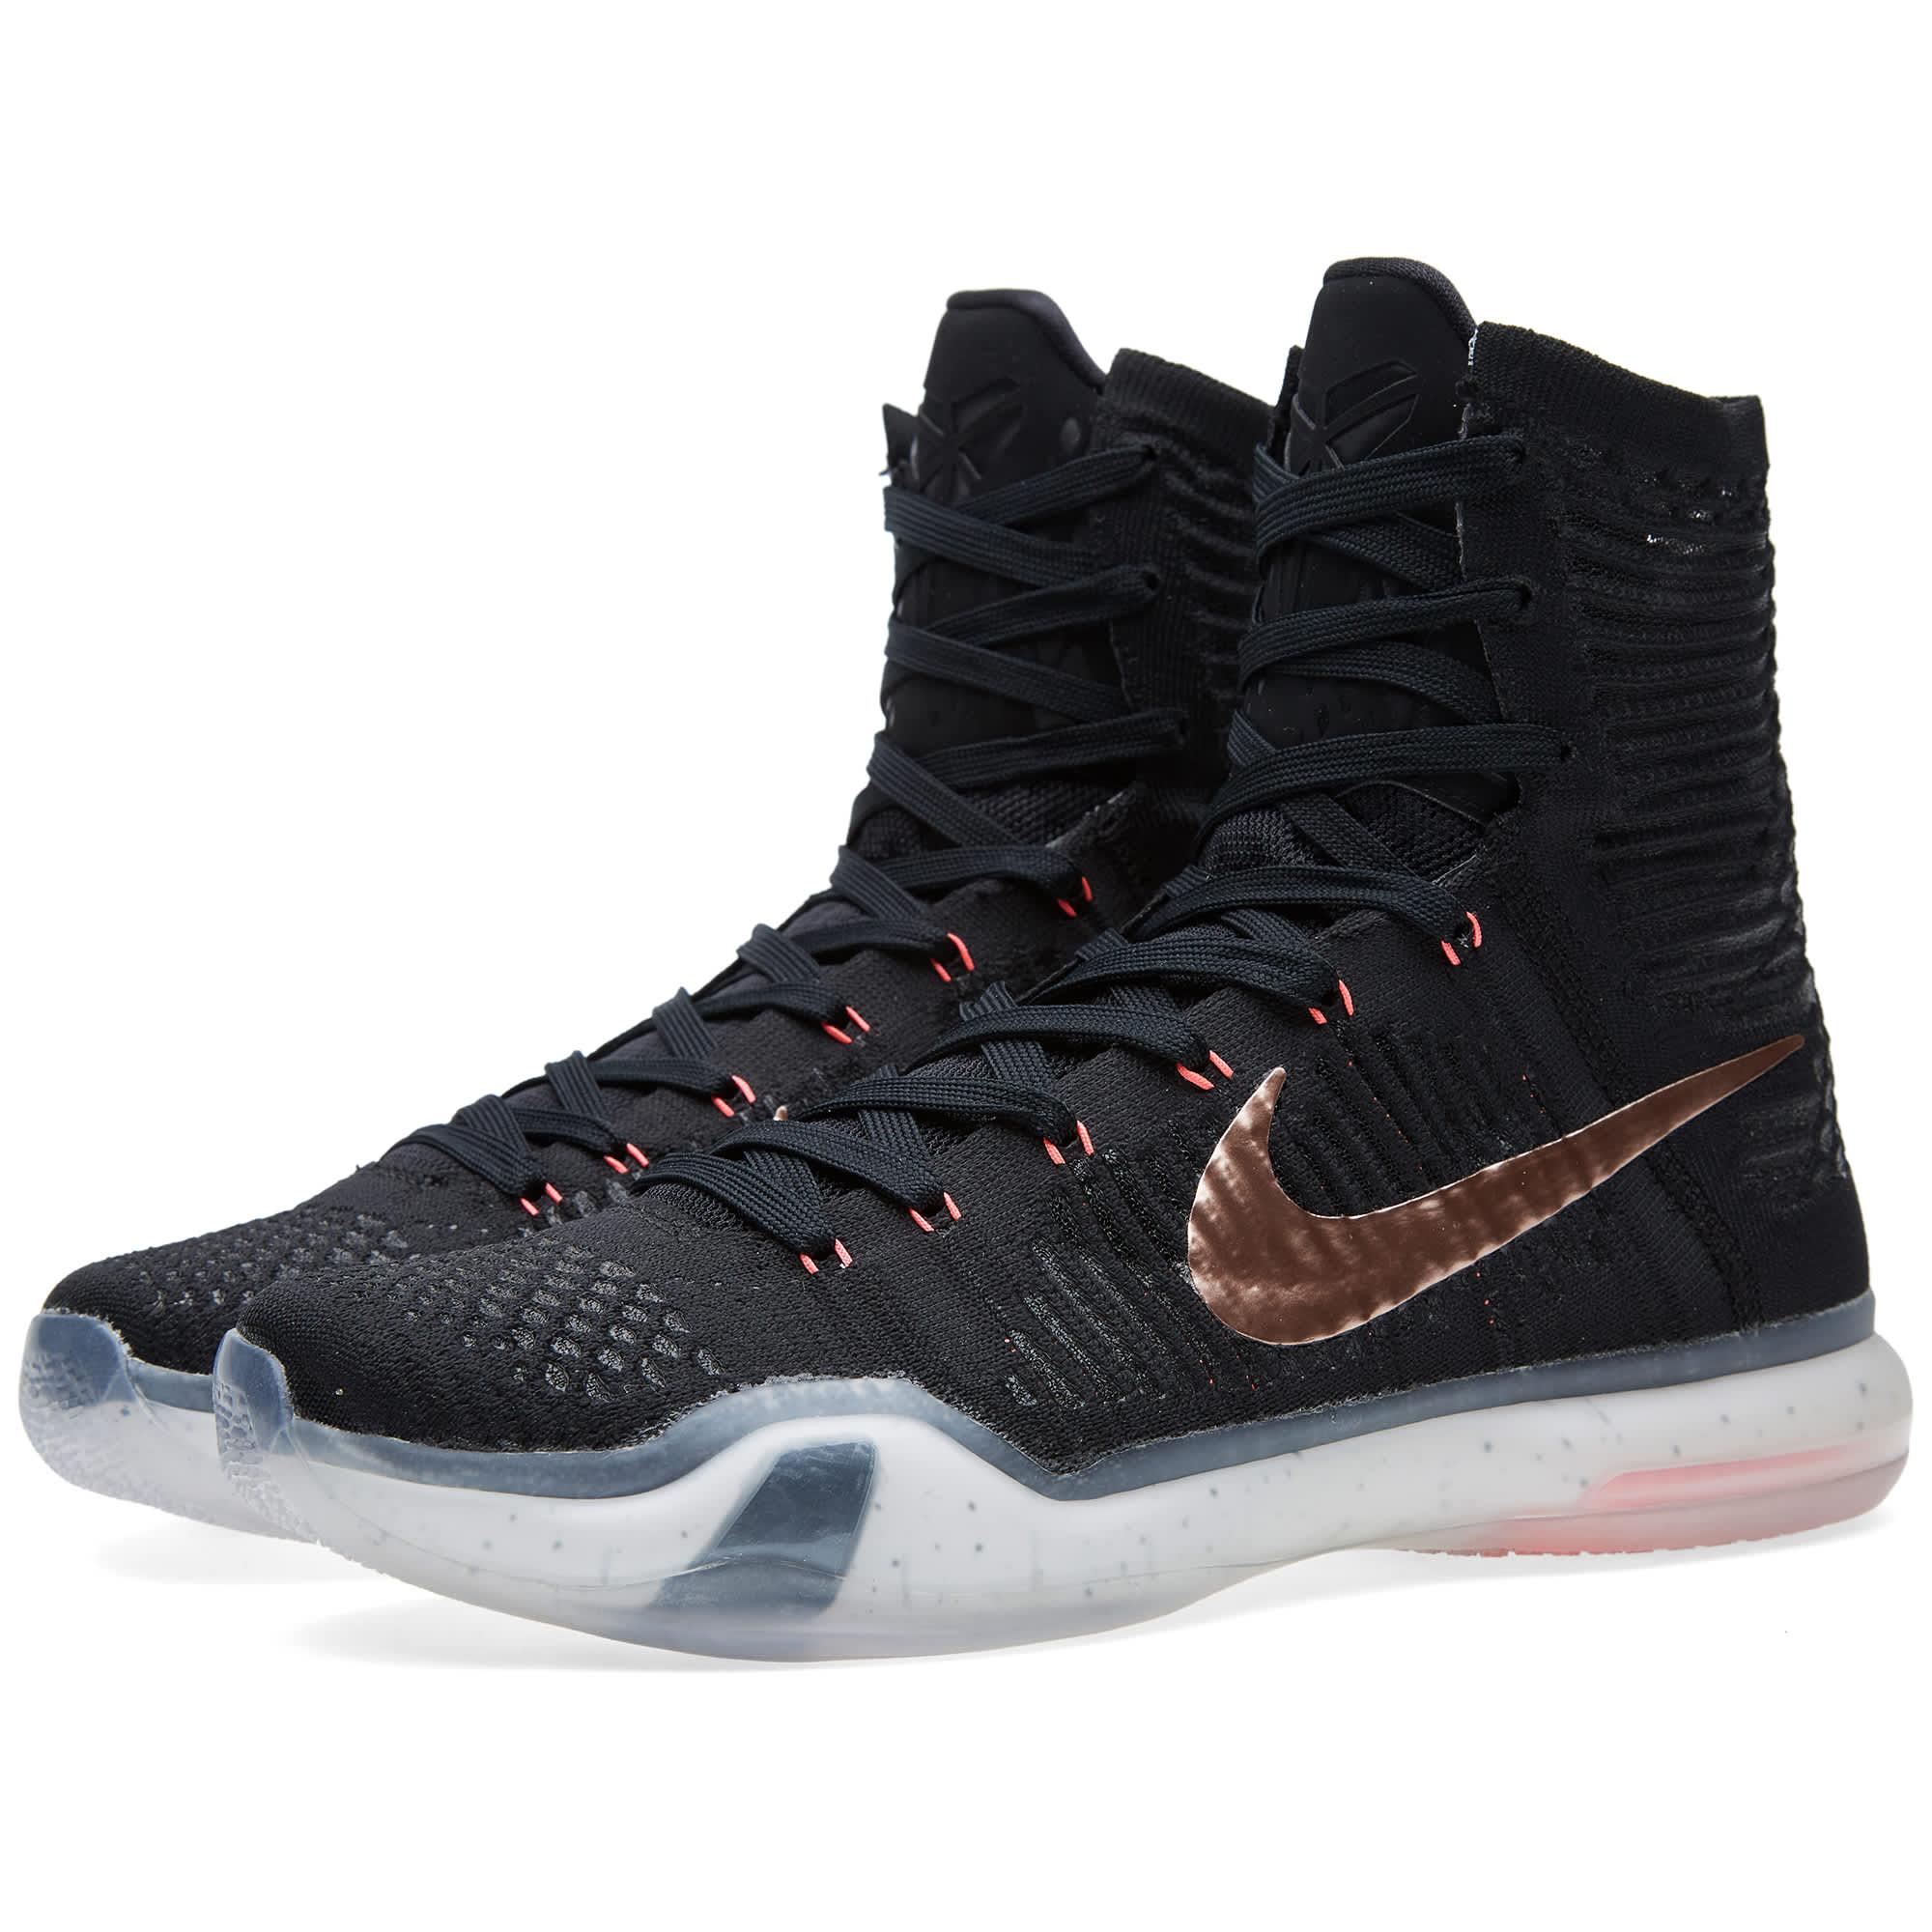 Nike Kobe X Elite 'Rose Gold' Black